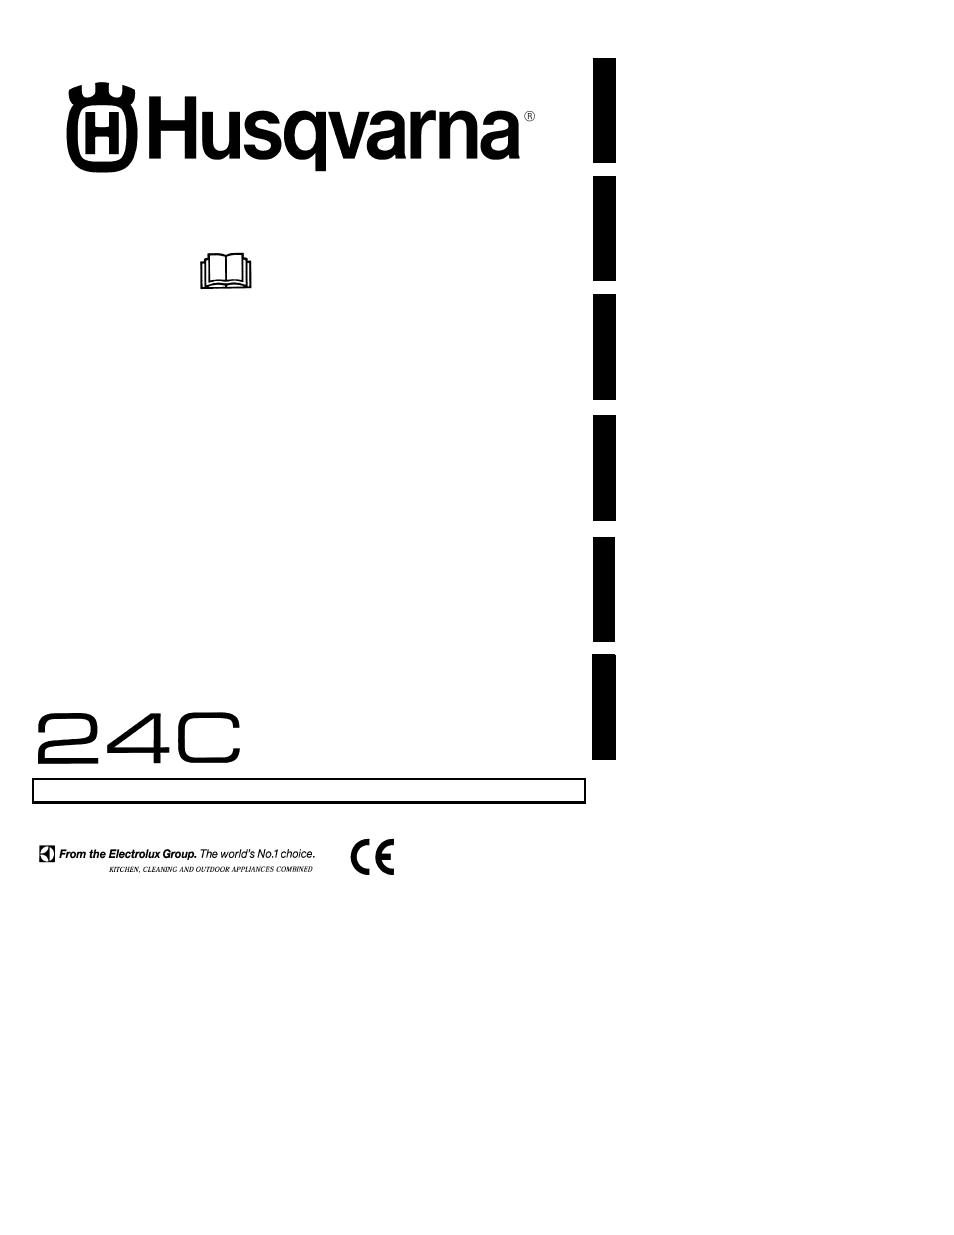 Husqvarna 24C User Manual | 12 pages